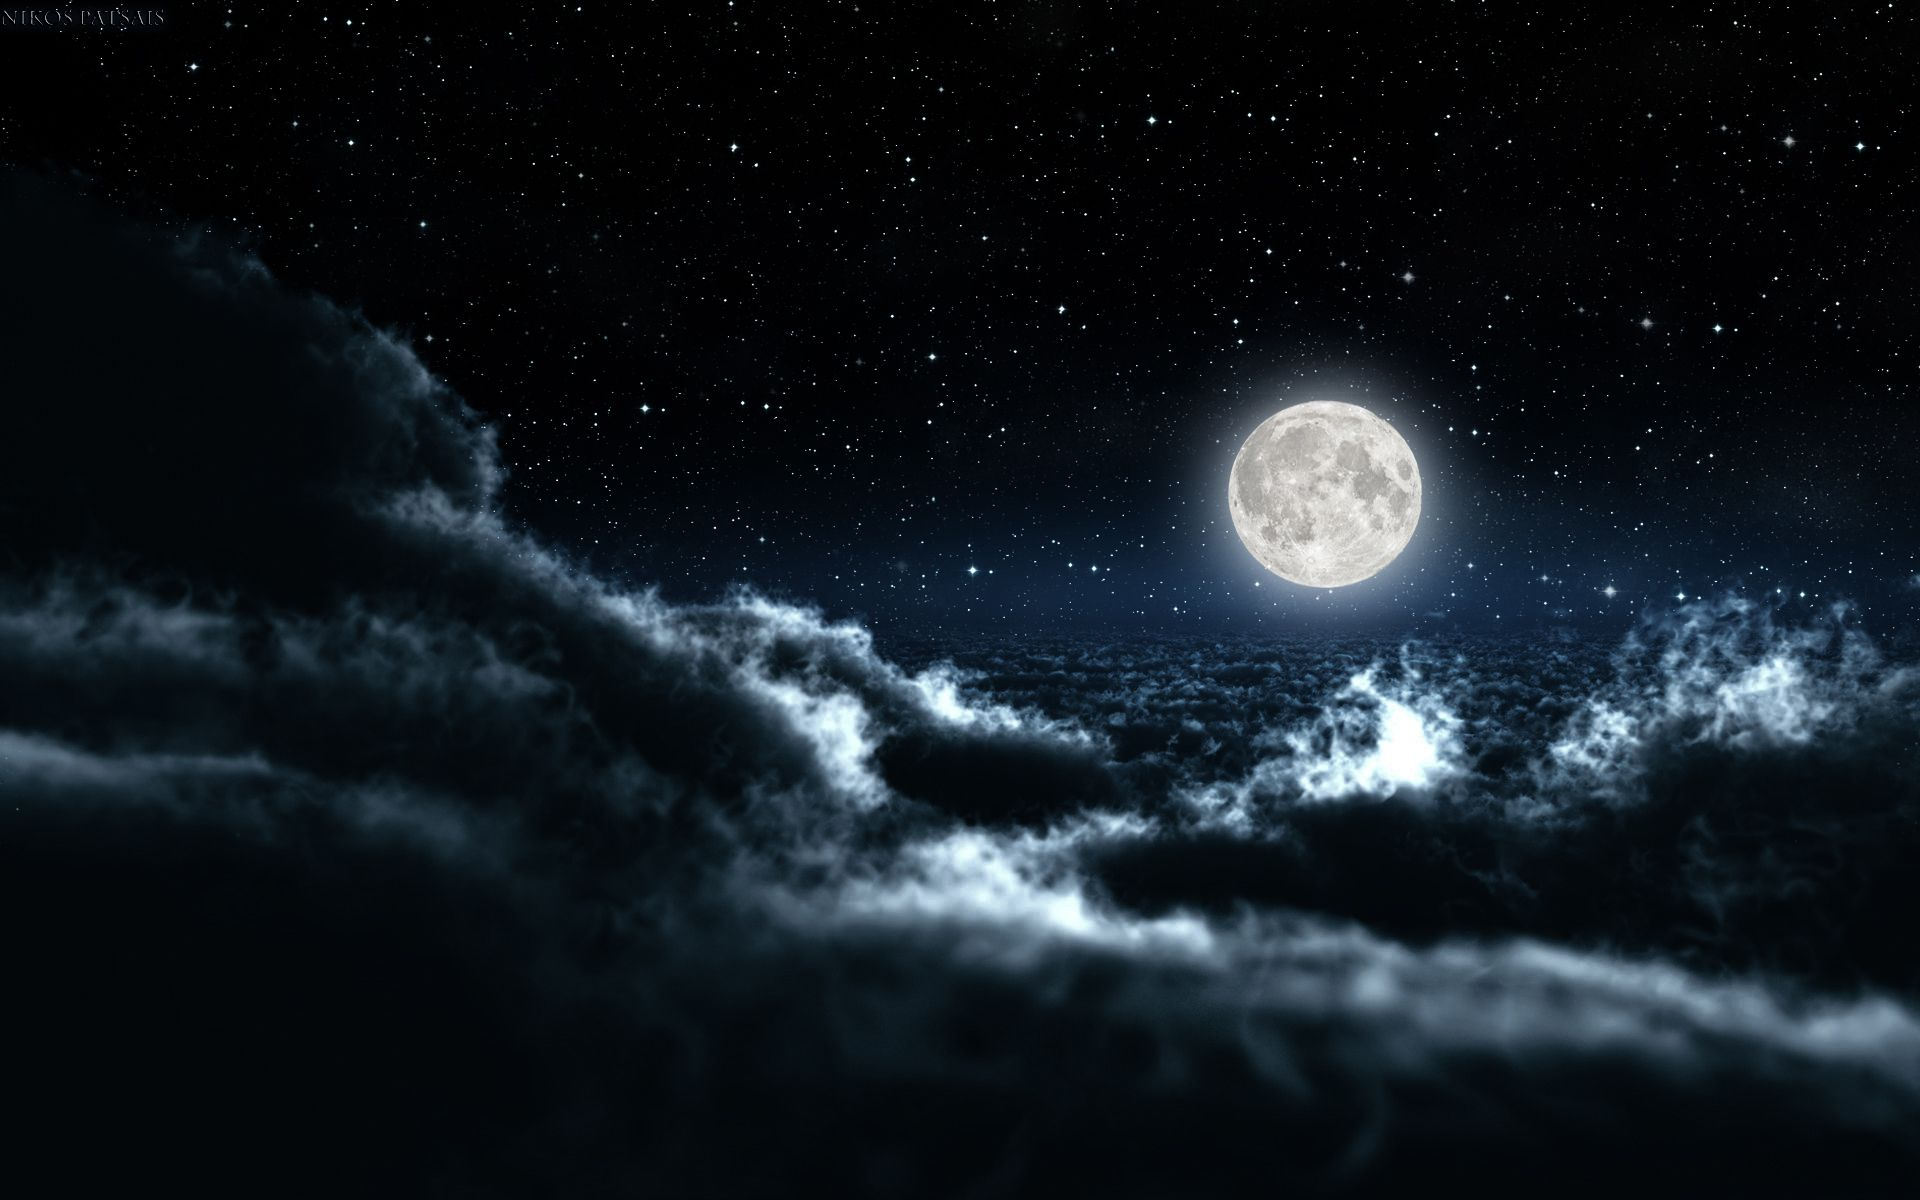 Night Sky Wide Desktop Background Wallpapers Hd Free 513489 Bầu Trời đem Bầu Trời Hinh Nền